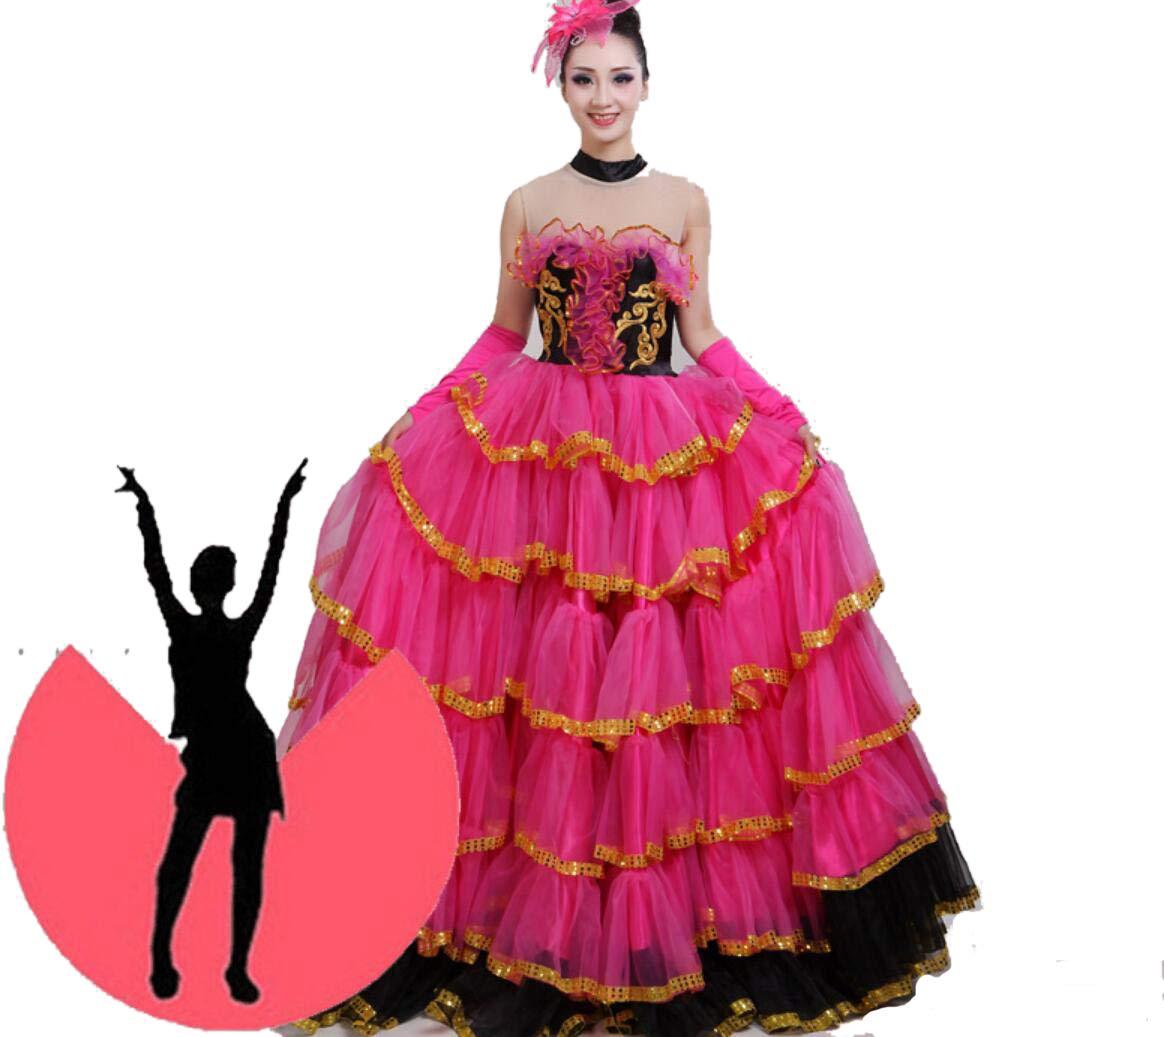 B XXXL Gypsy jupe Belly Dance, FlaHommesco Jupe Costume Danse Les Costumes Grand Pendule Jupe